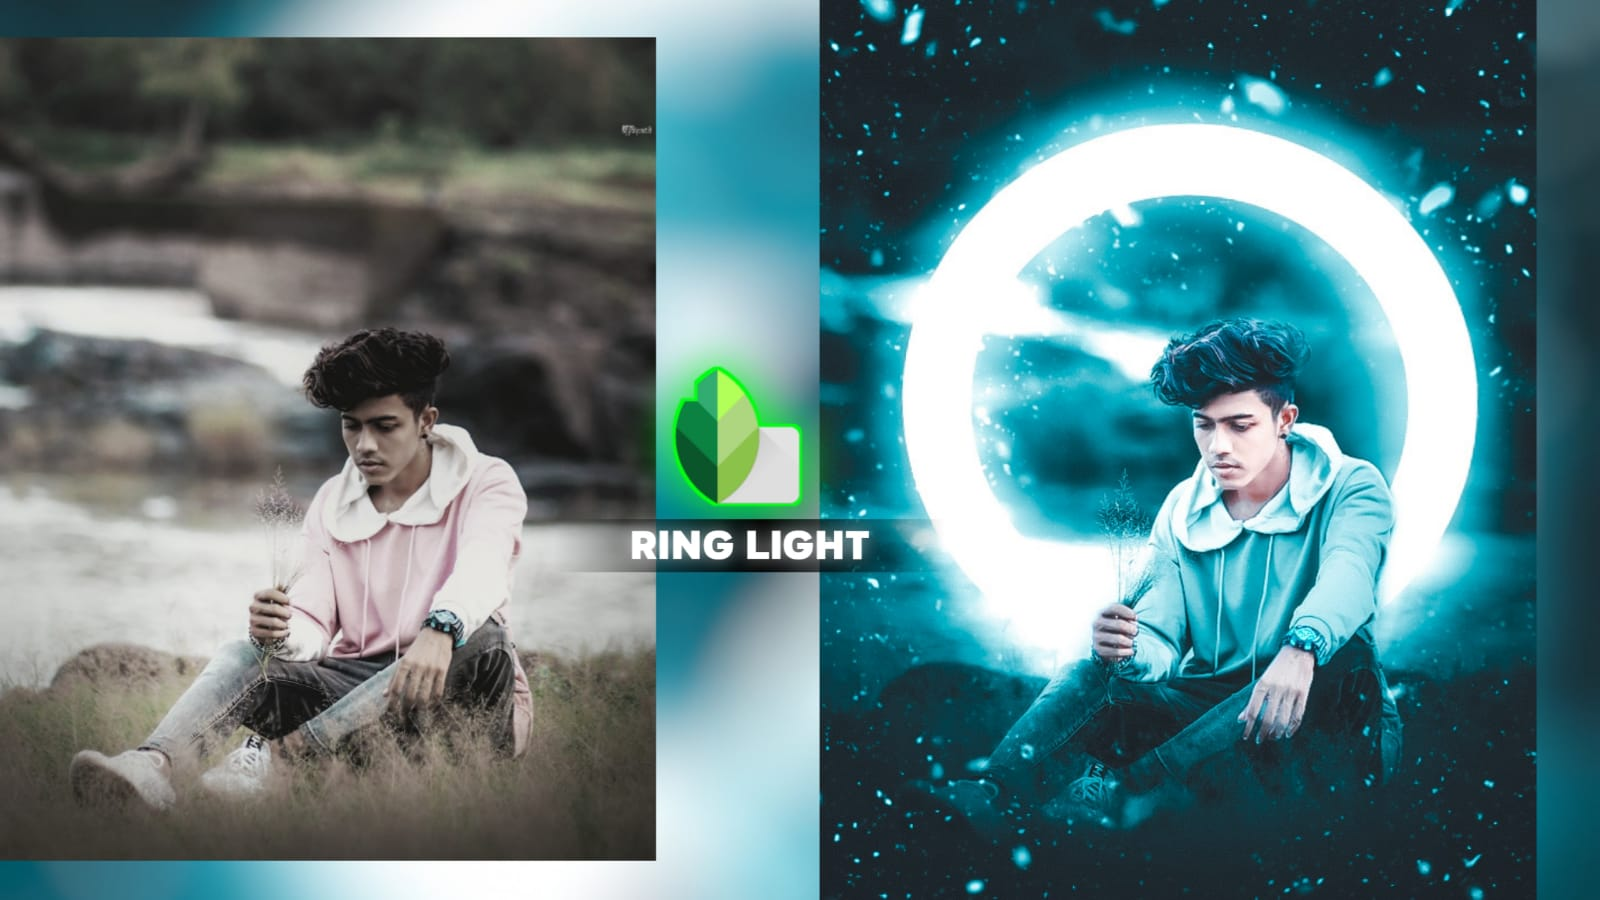 Snapseed Ring Light Editing